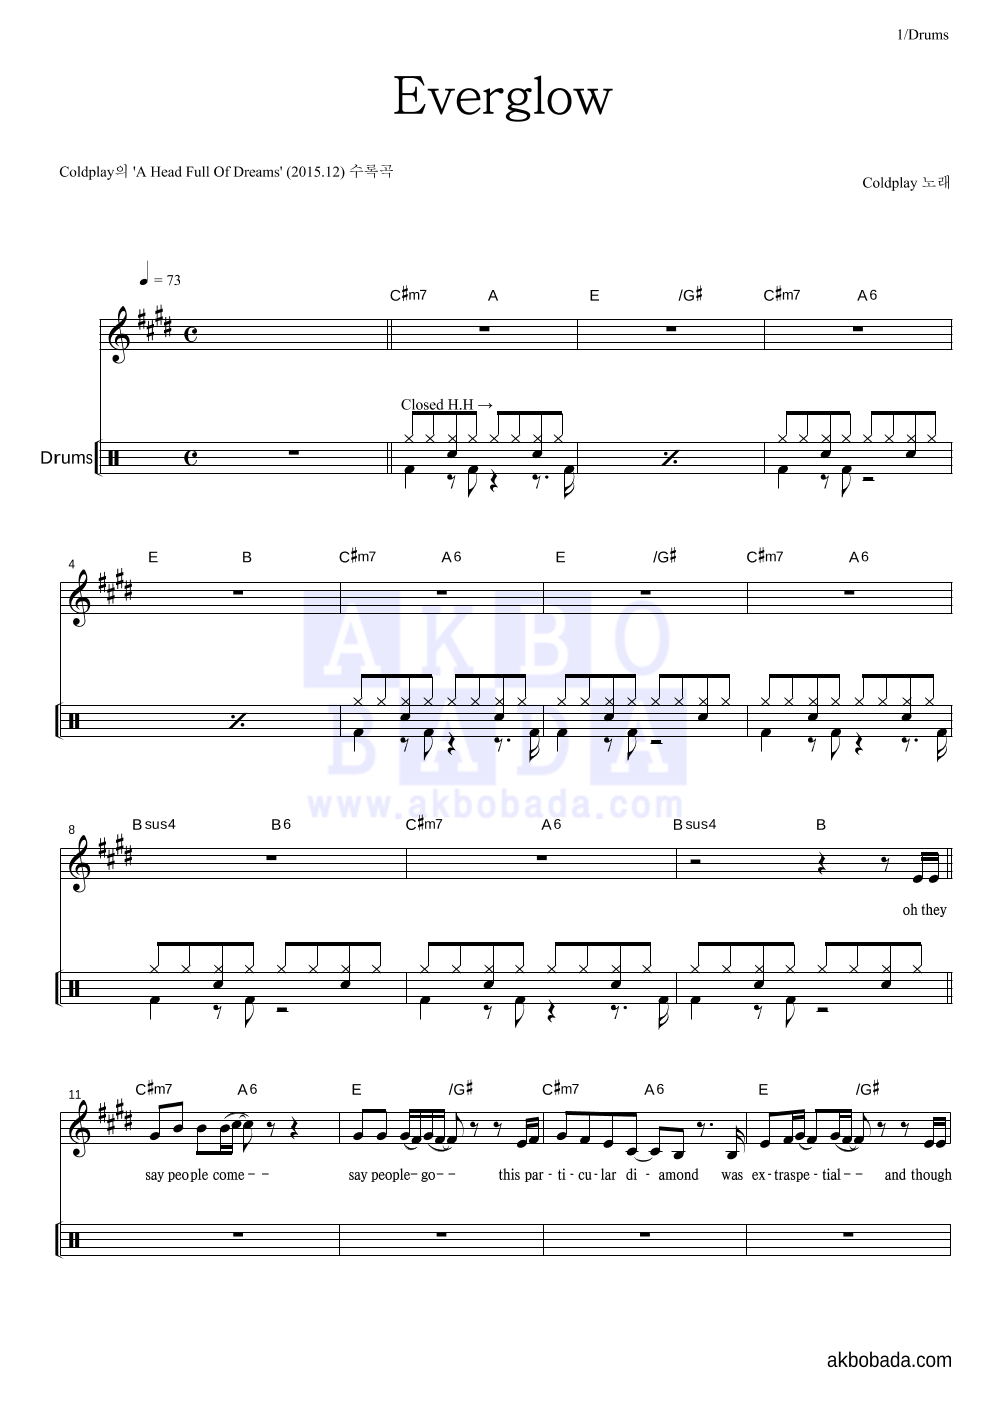 Coldplay - Everglow 드럼 악보